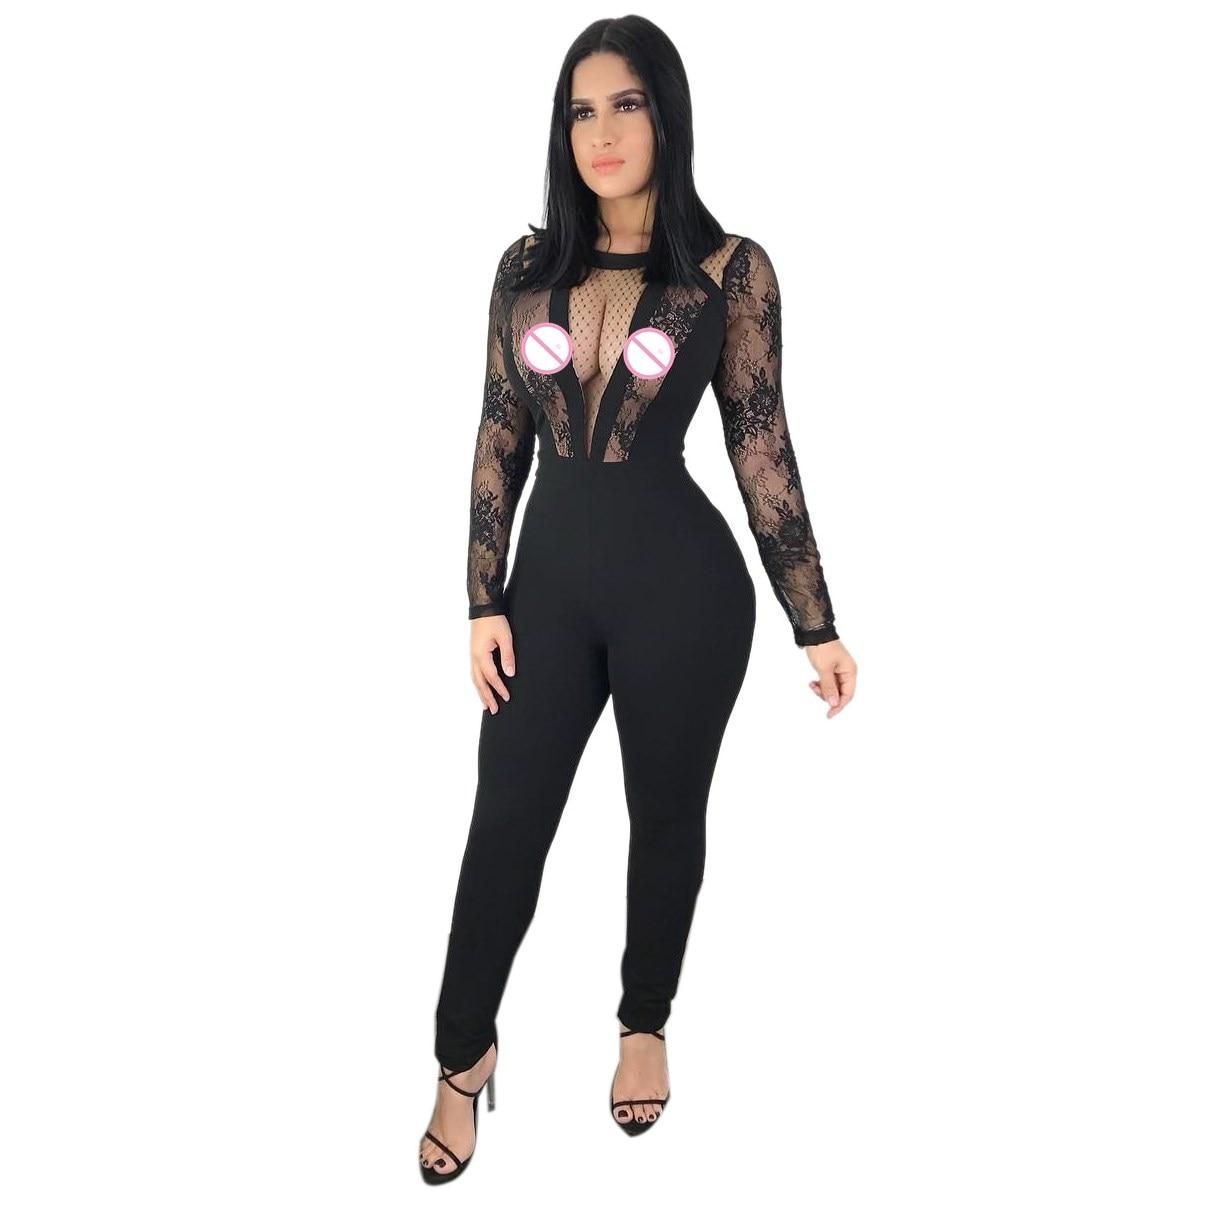 PüNktlich Frauen Sheer Mesh-body Plus Größe Körper Tops Transparent Langarm Schwarz Overall Body Damen Overall-club Overalls Bodys